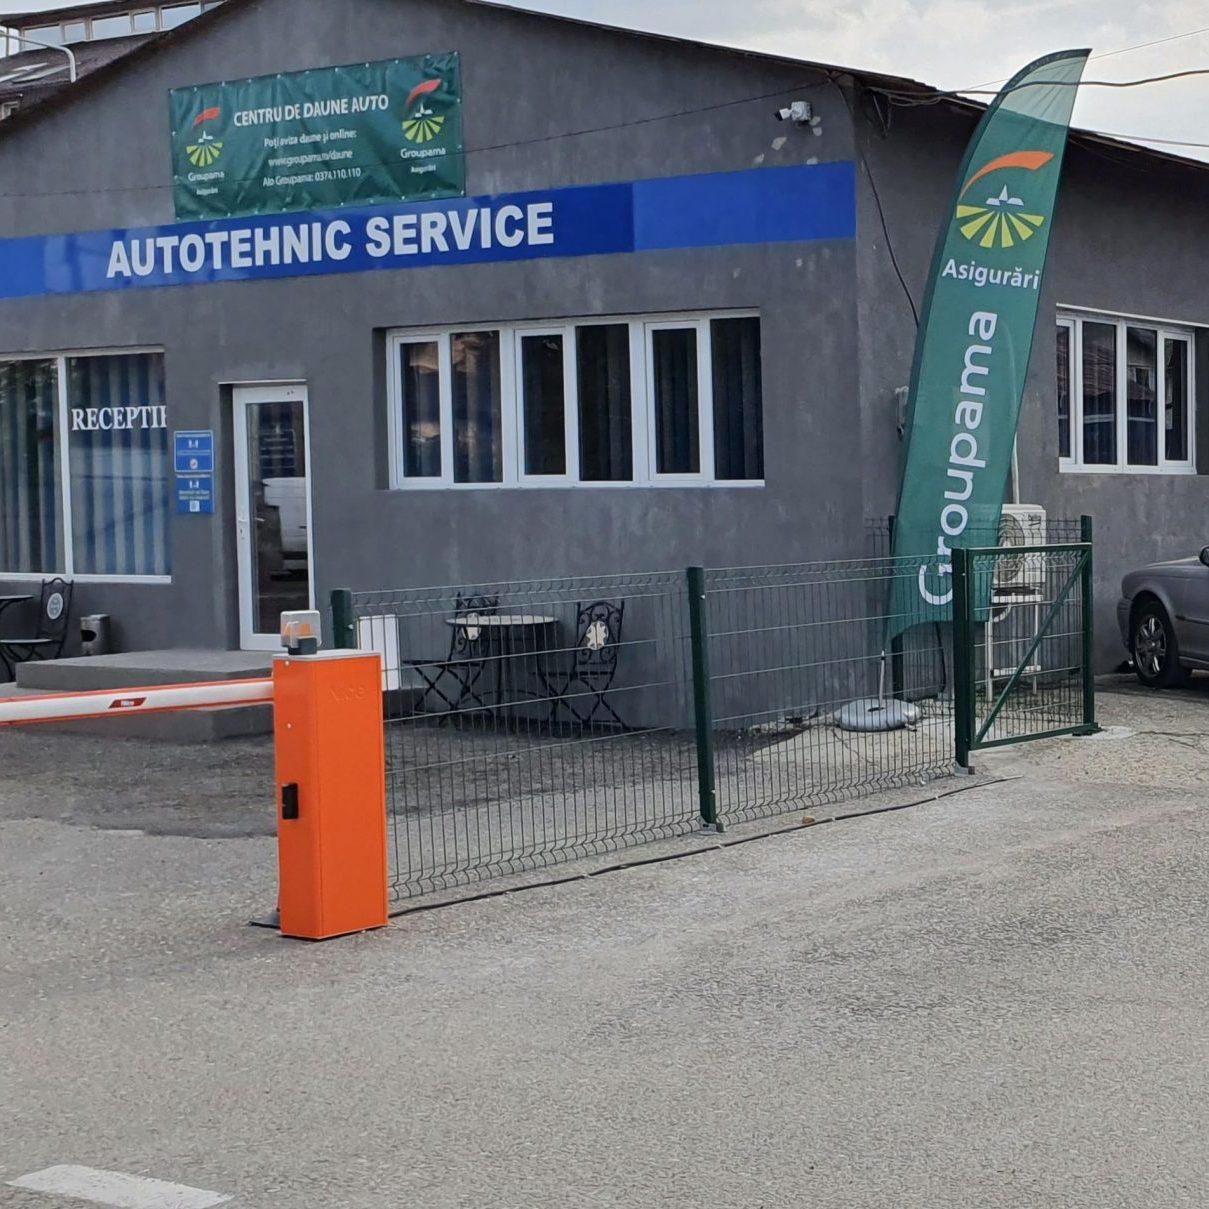 Receptie Autotehnic Service Auto